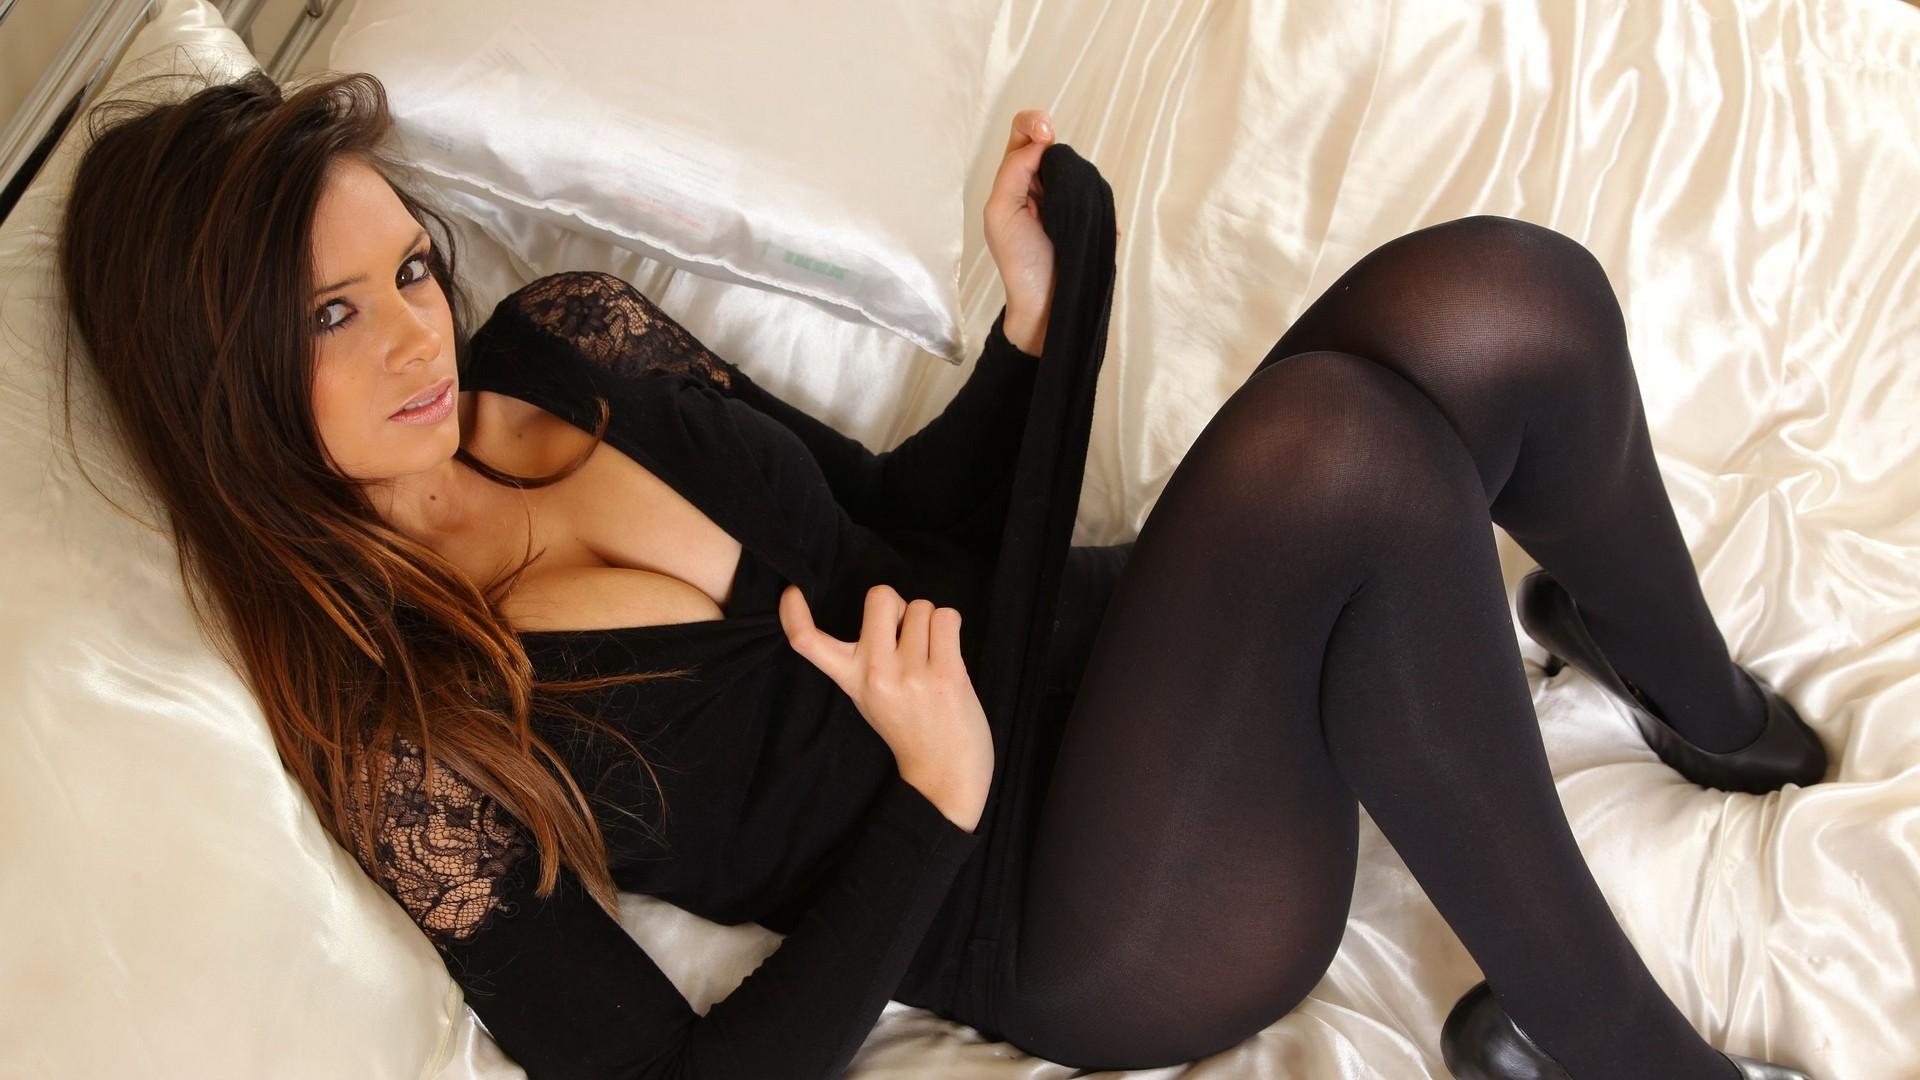 People 1920x1080 Louisa Marie women cleavage brunette stockings pantyhose tights women indoors boobs